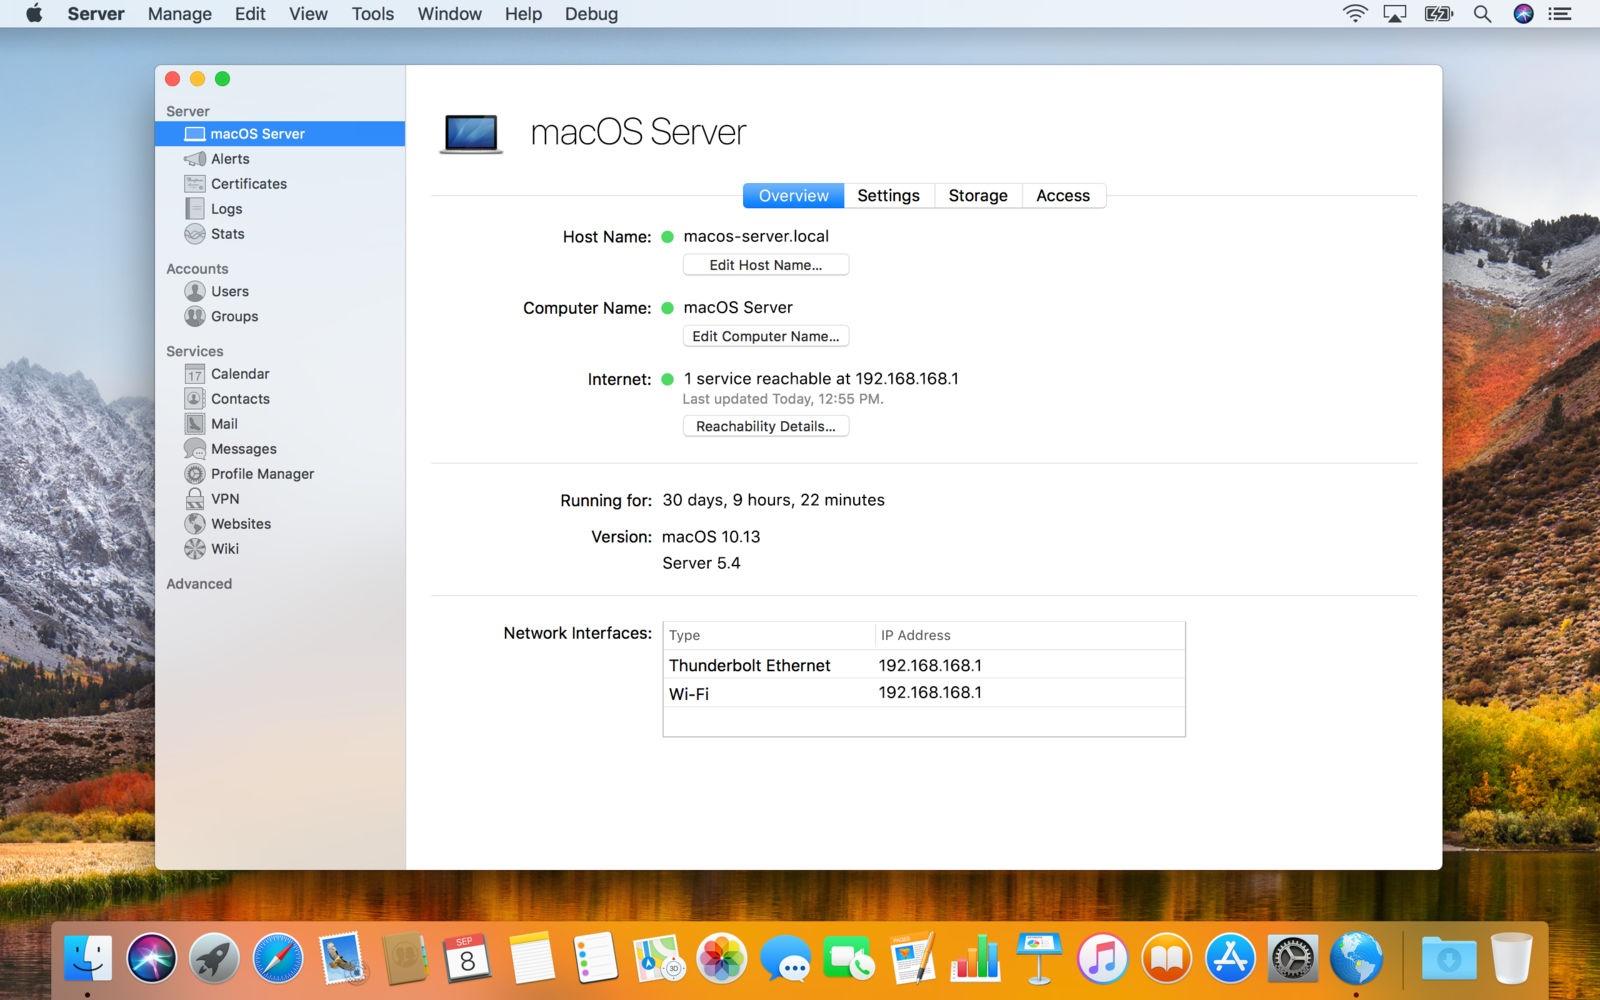 macOS Server screen.jpg